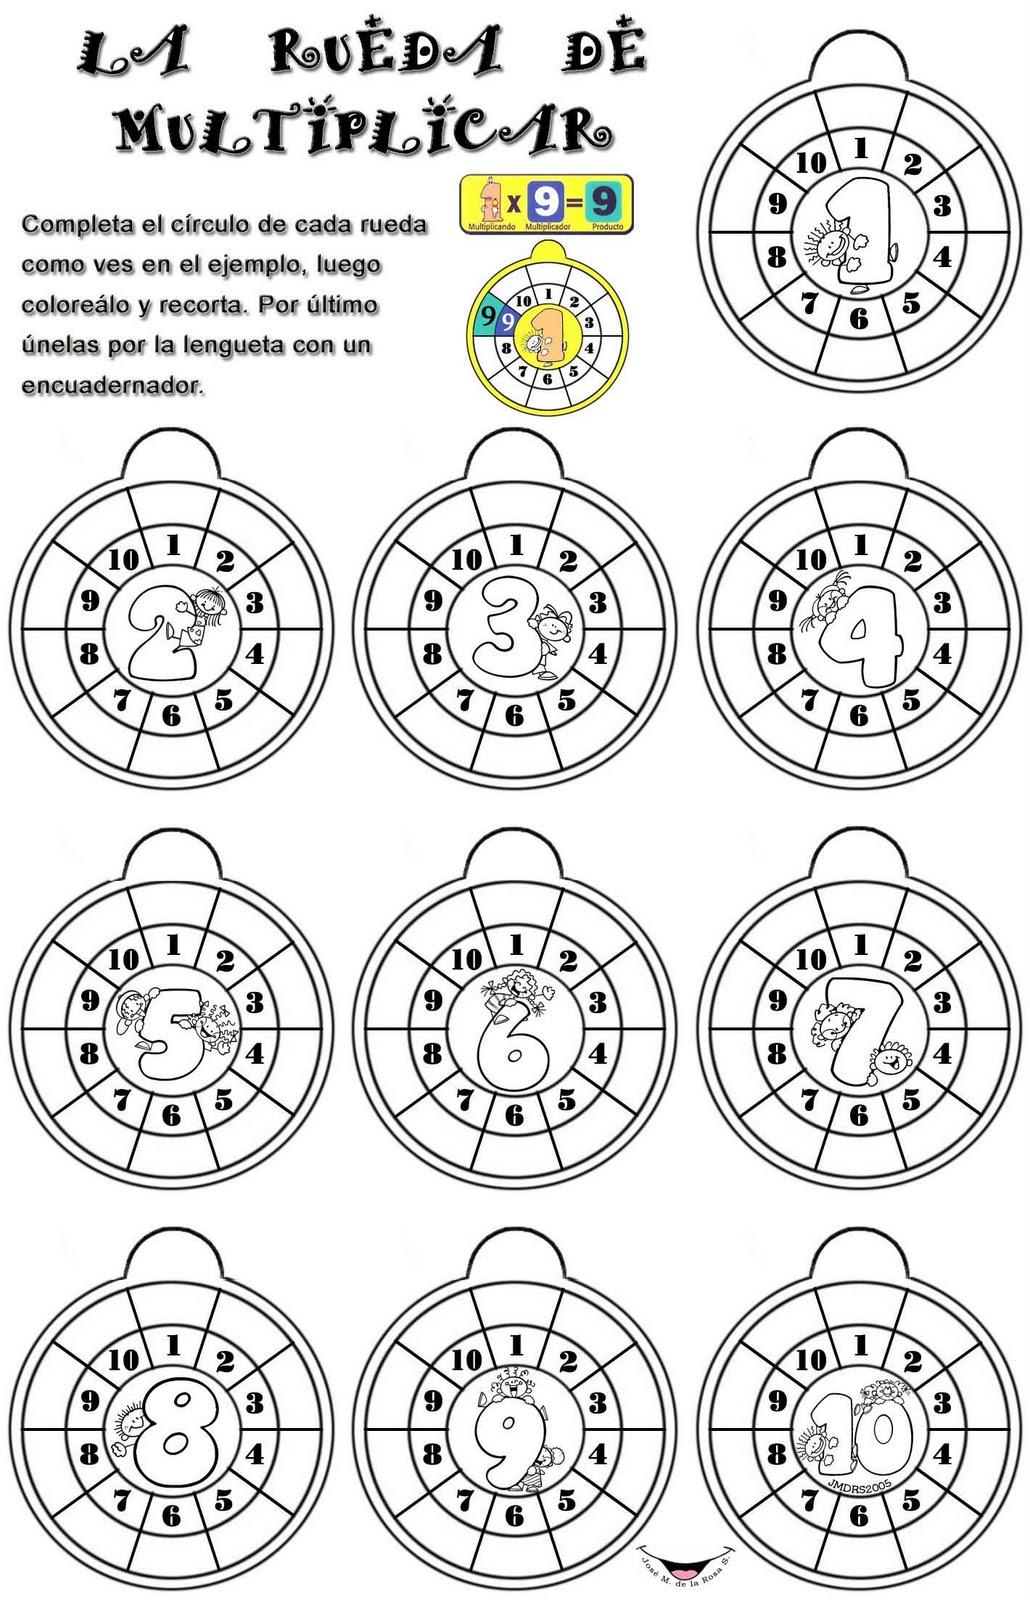 Moen S6700 Parts List And Diagram Ereplacementpartscom